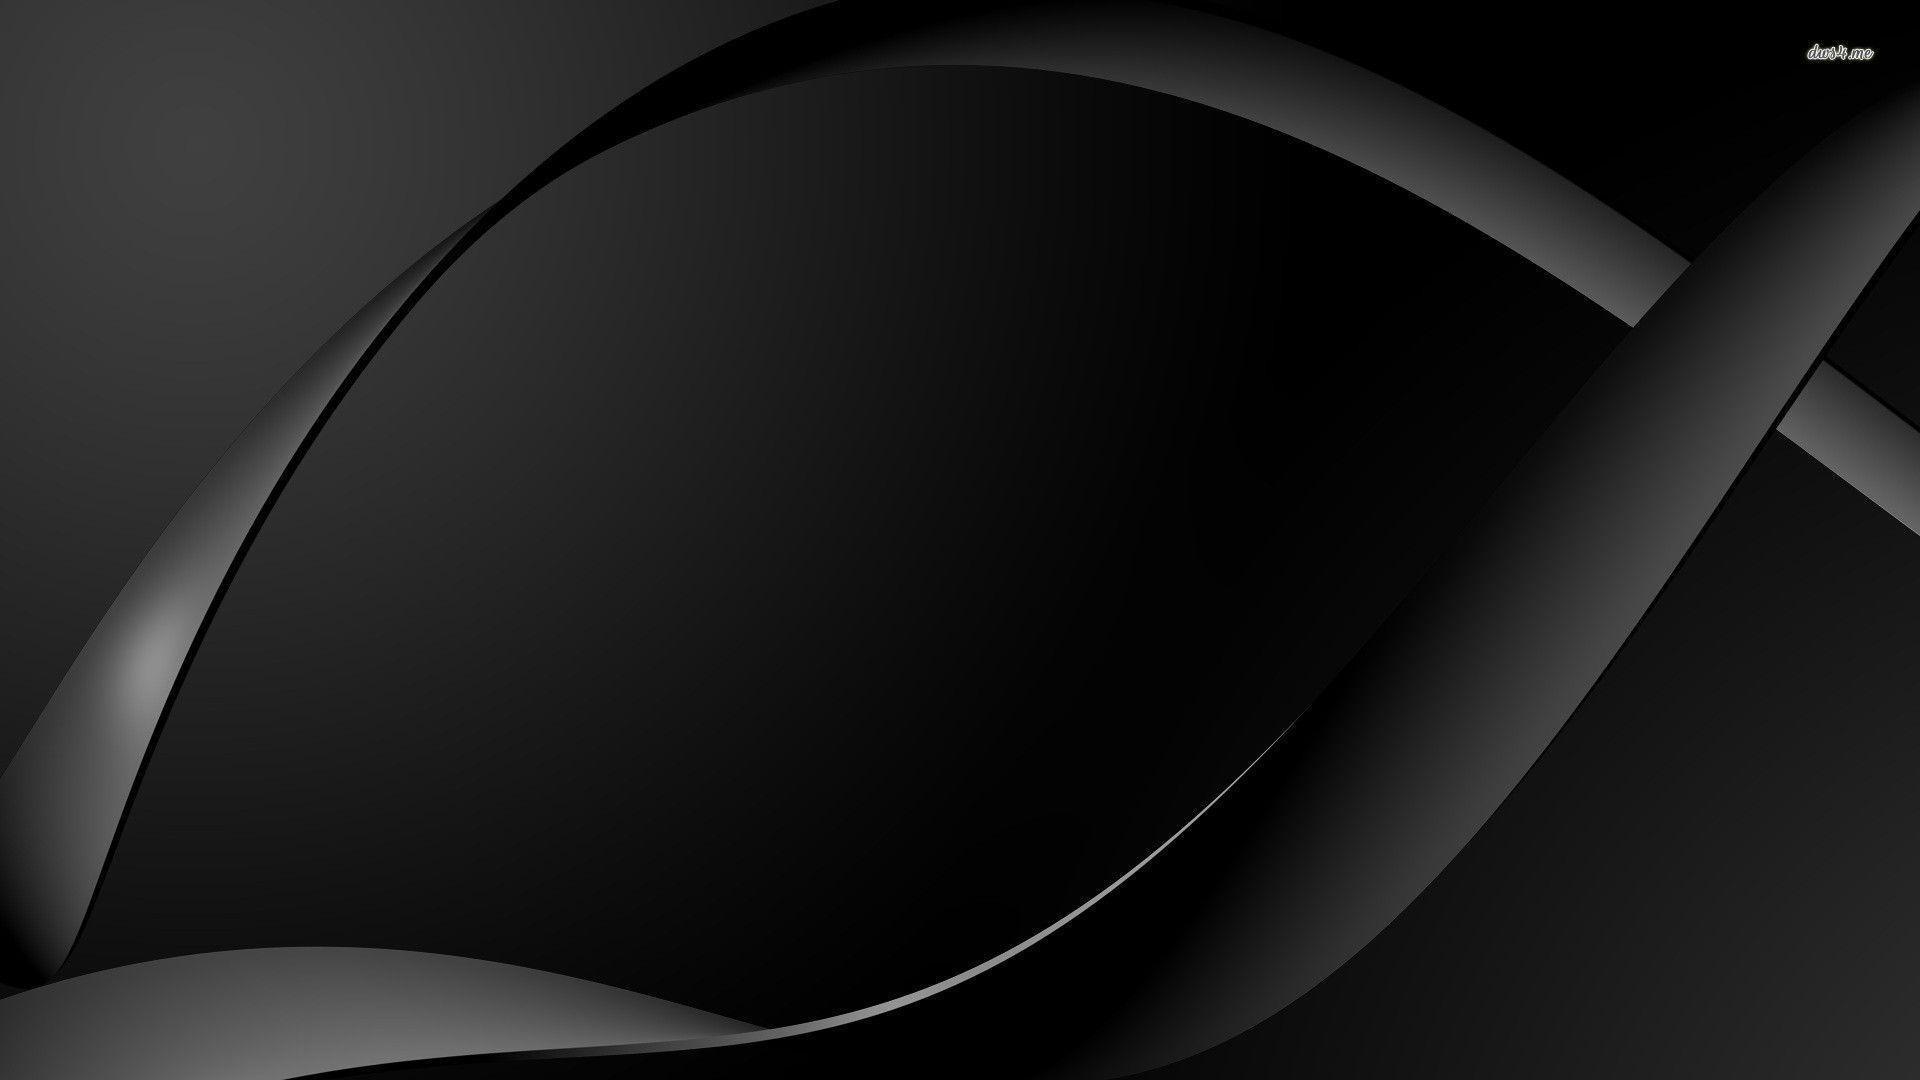 Black Abstract Wallpaper Hd Widescreen 10 HD Wallpapers | lzamgs.